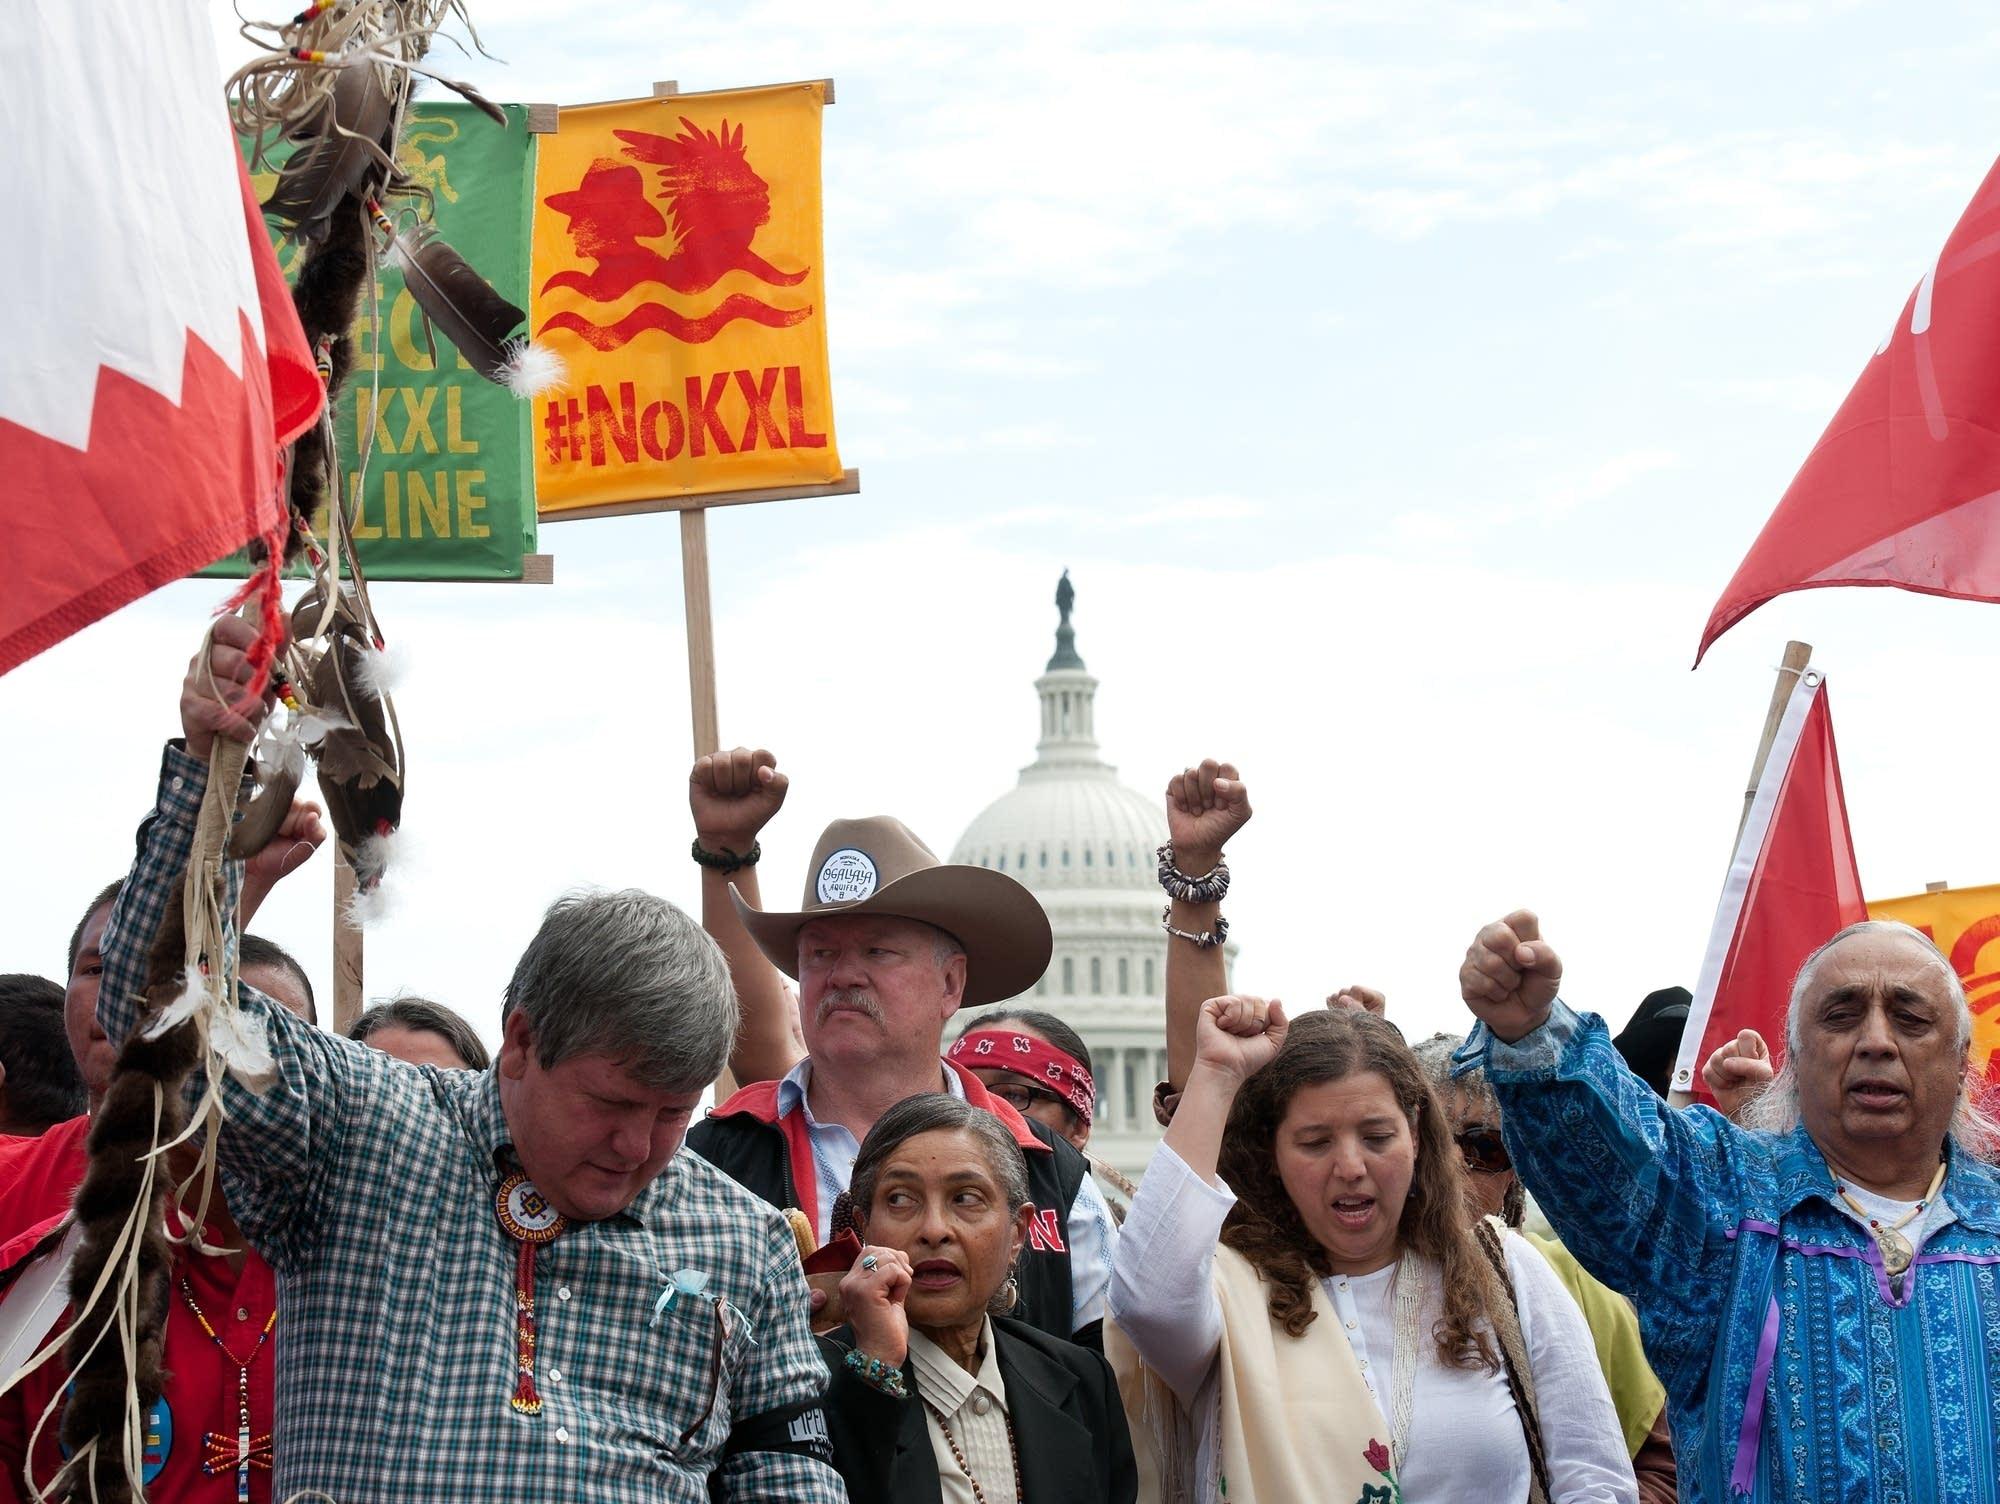 April 2014 protests in Washington, D.C.